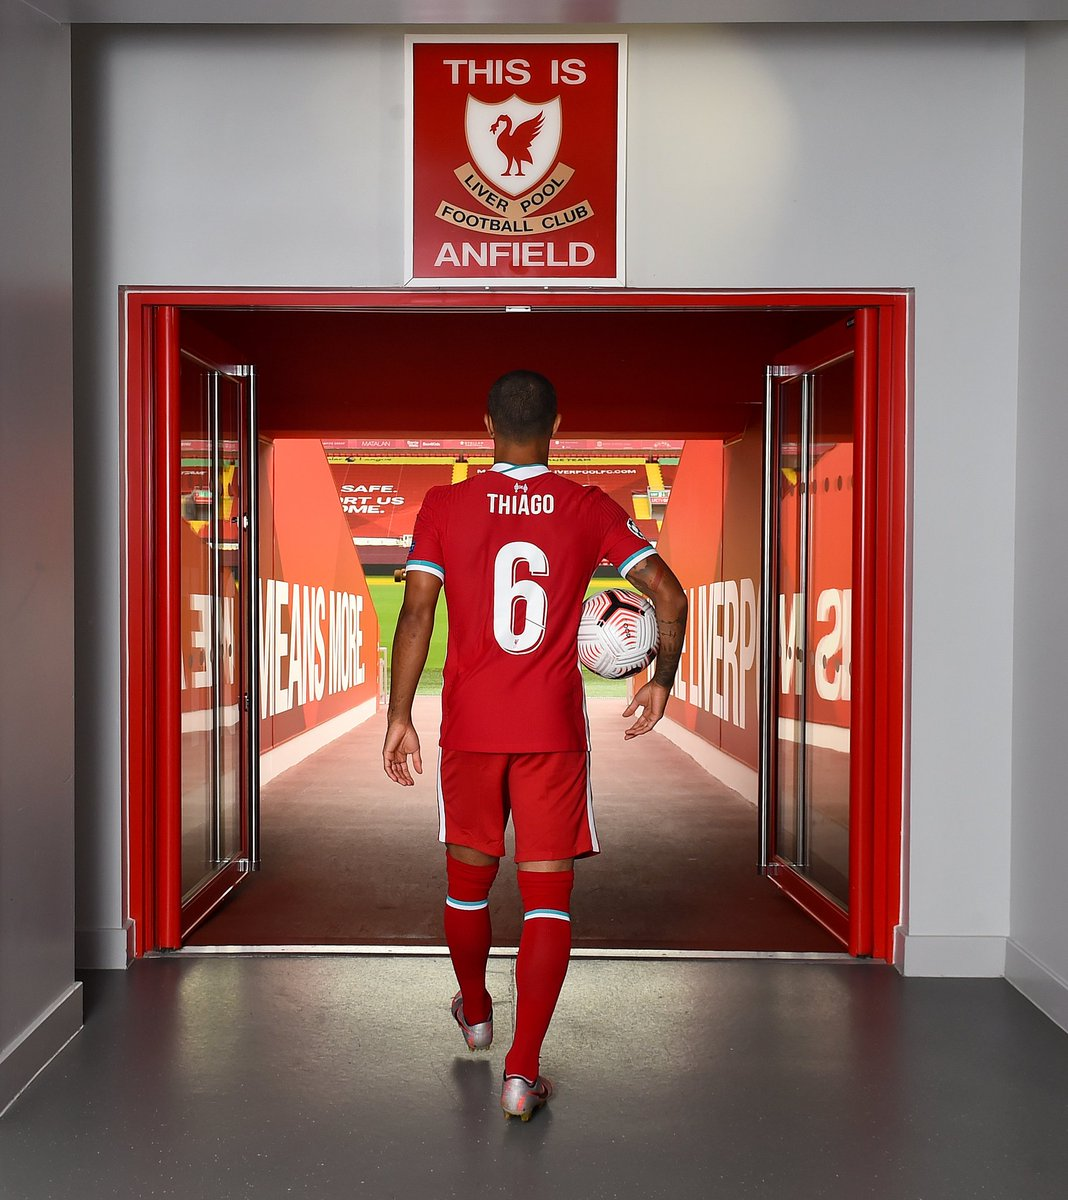 🤯📸 ¡@Thiago6 ya luce los colores del Liverpool!   Los 'Reds' llegarán hasta _________ en la Champions League la próxima temporada  #UCL https://t.co/GF4HsTzIel